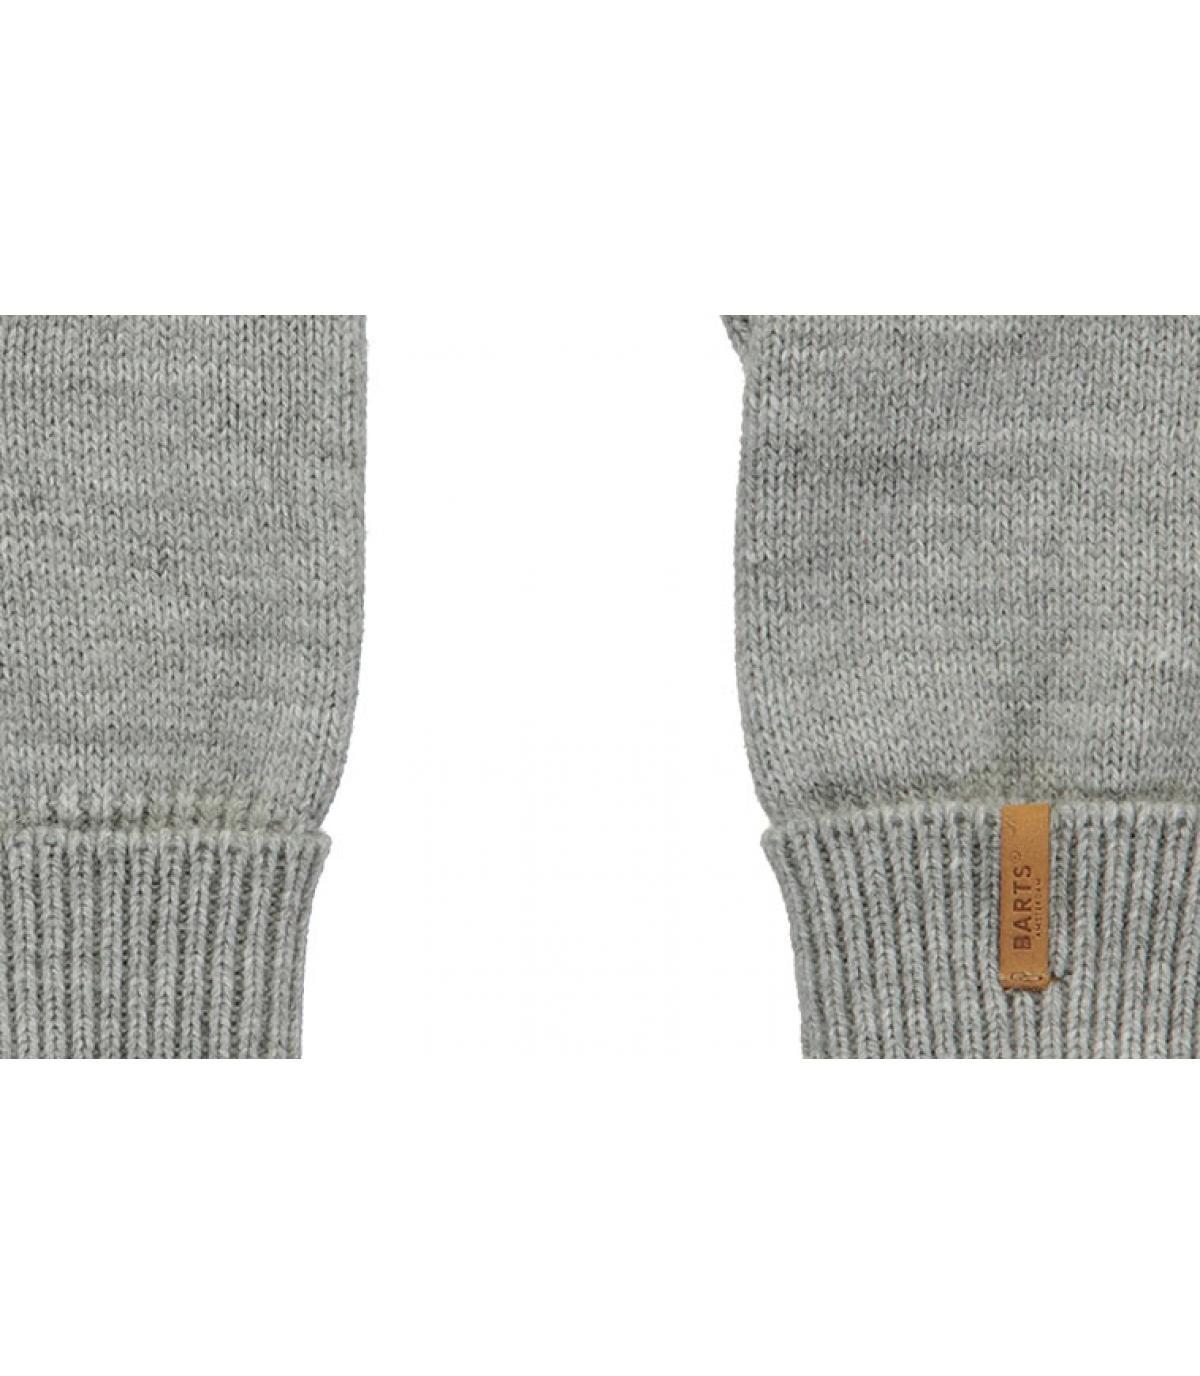 Detalles Fine Knitted Gloves heather grey imagen 2